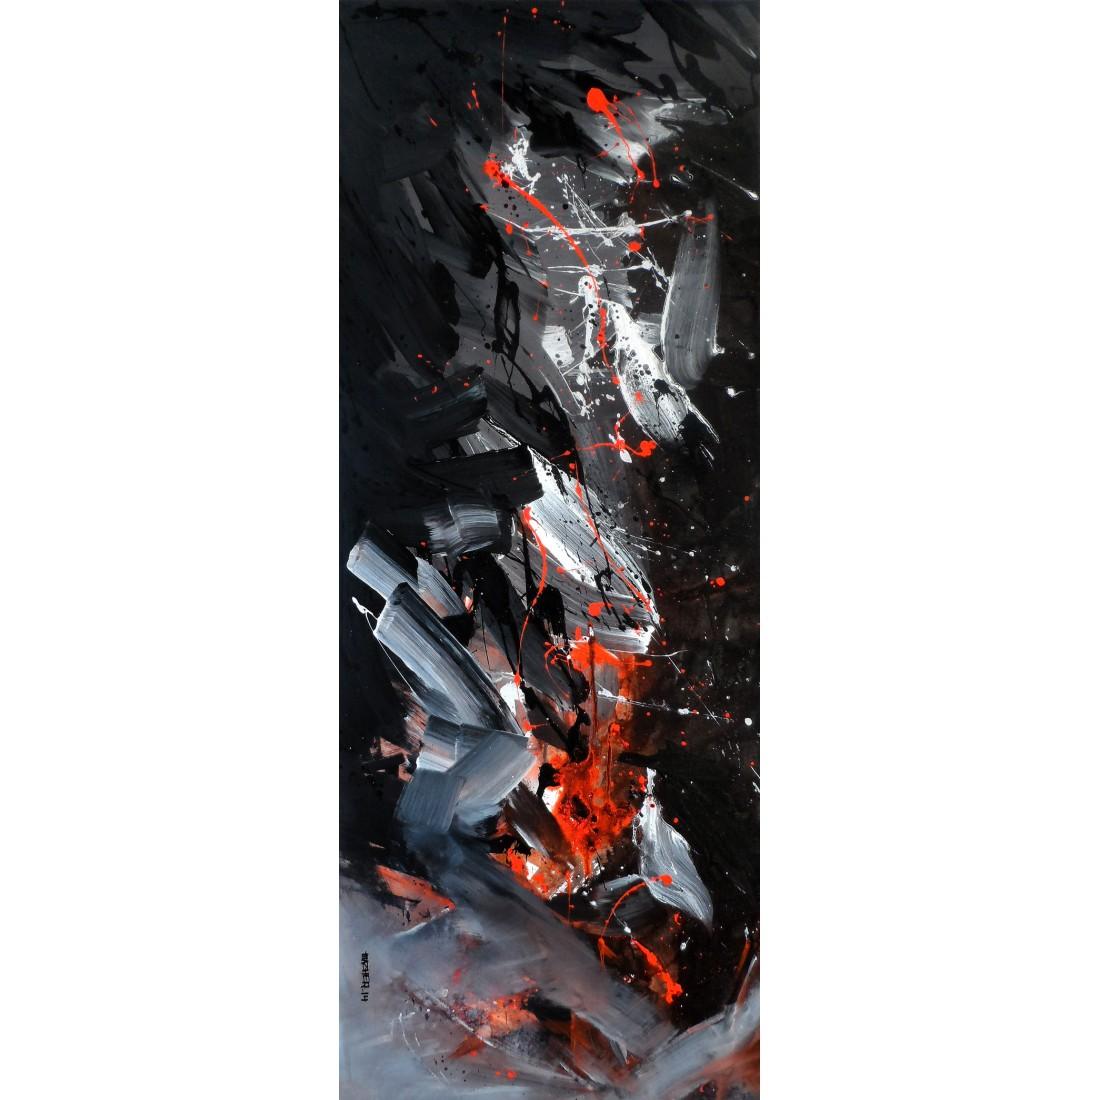 Thesis art/name